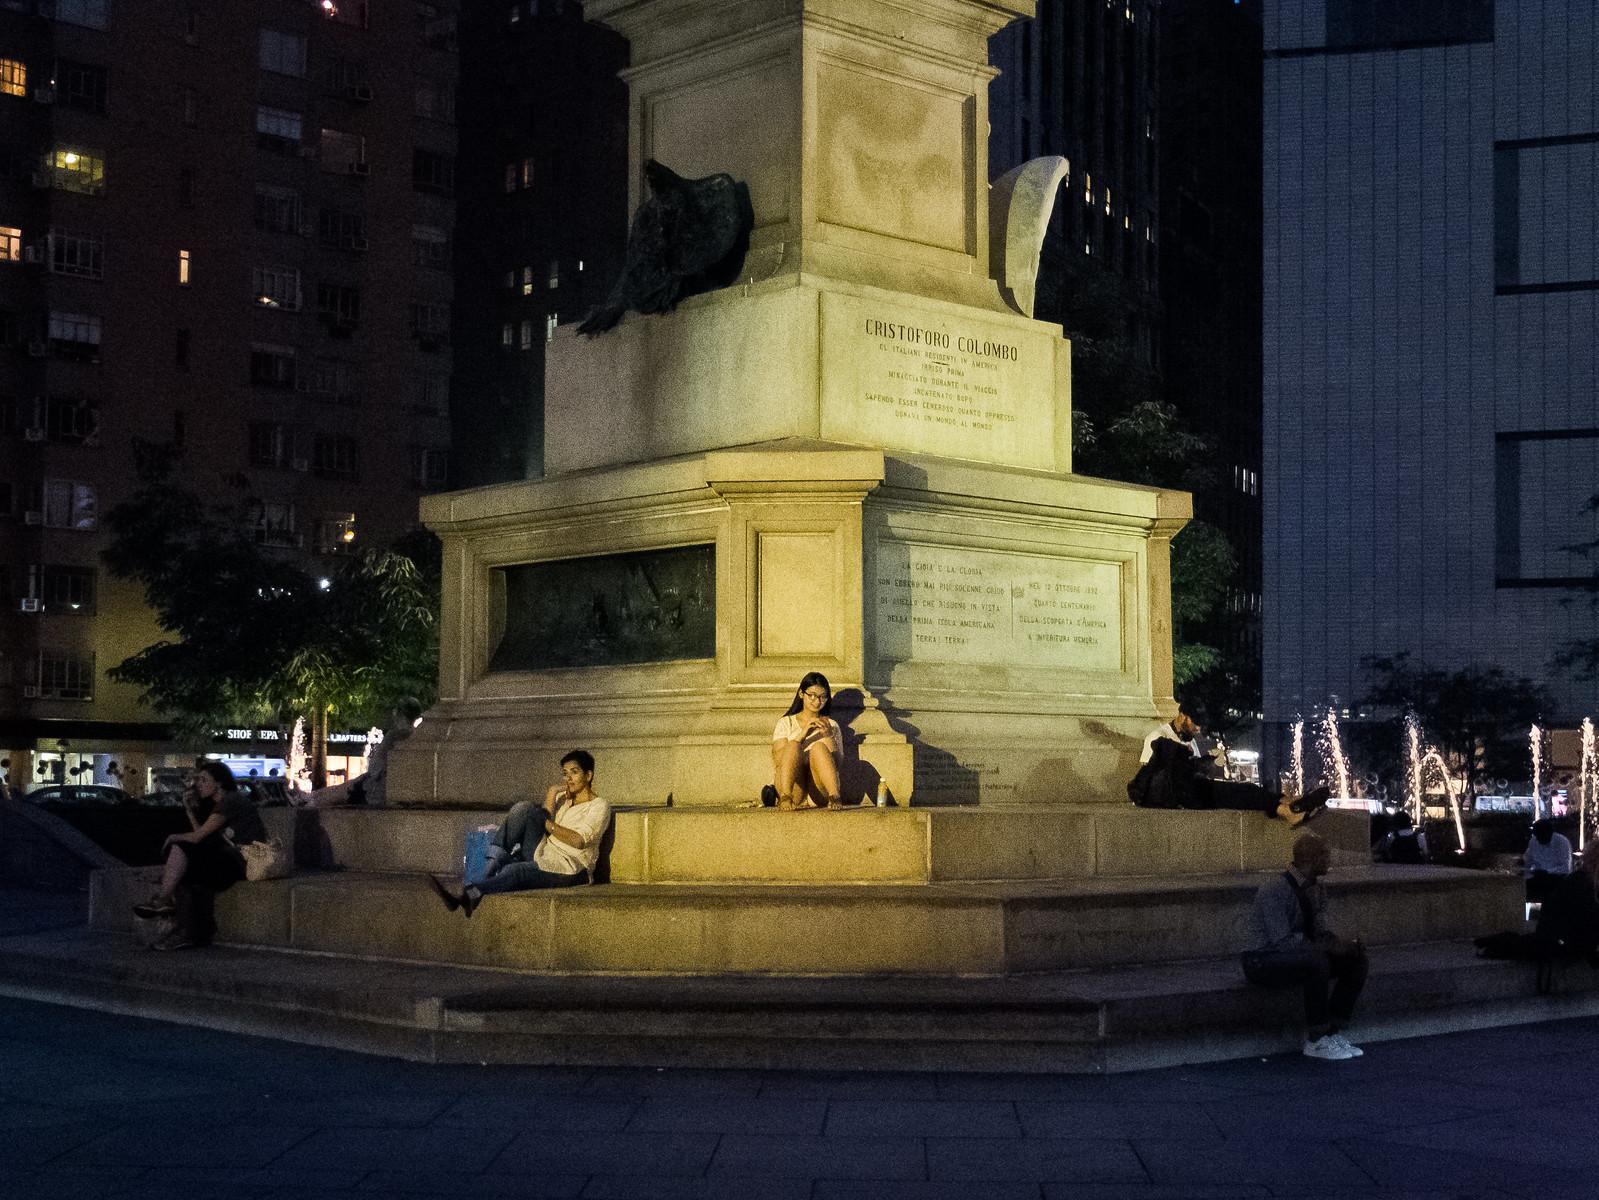 Hanging out at Columbus Circle by wwward0